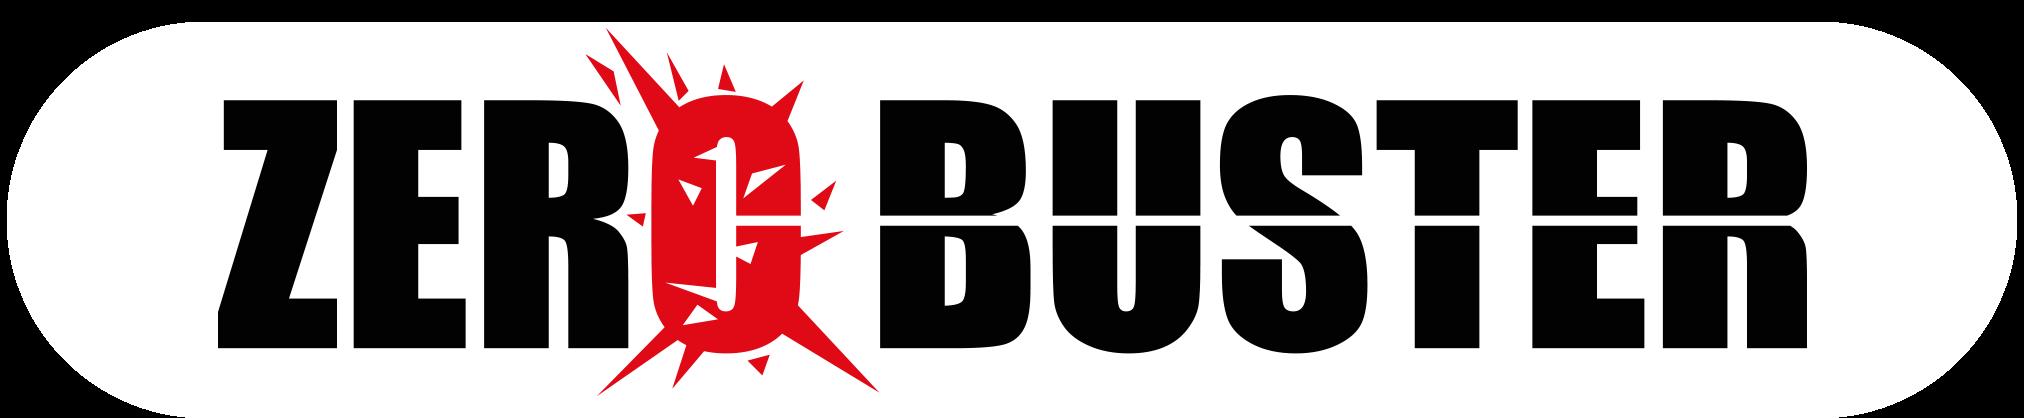 high ticket siphon logo med